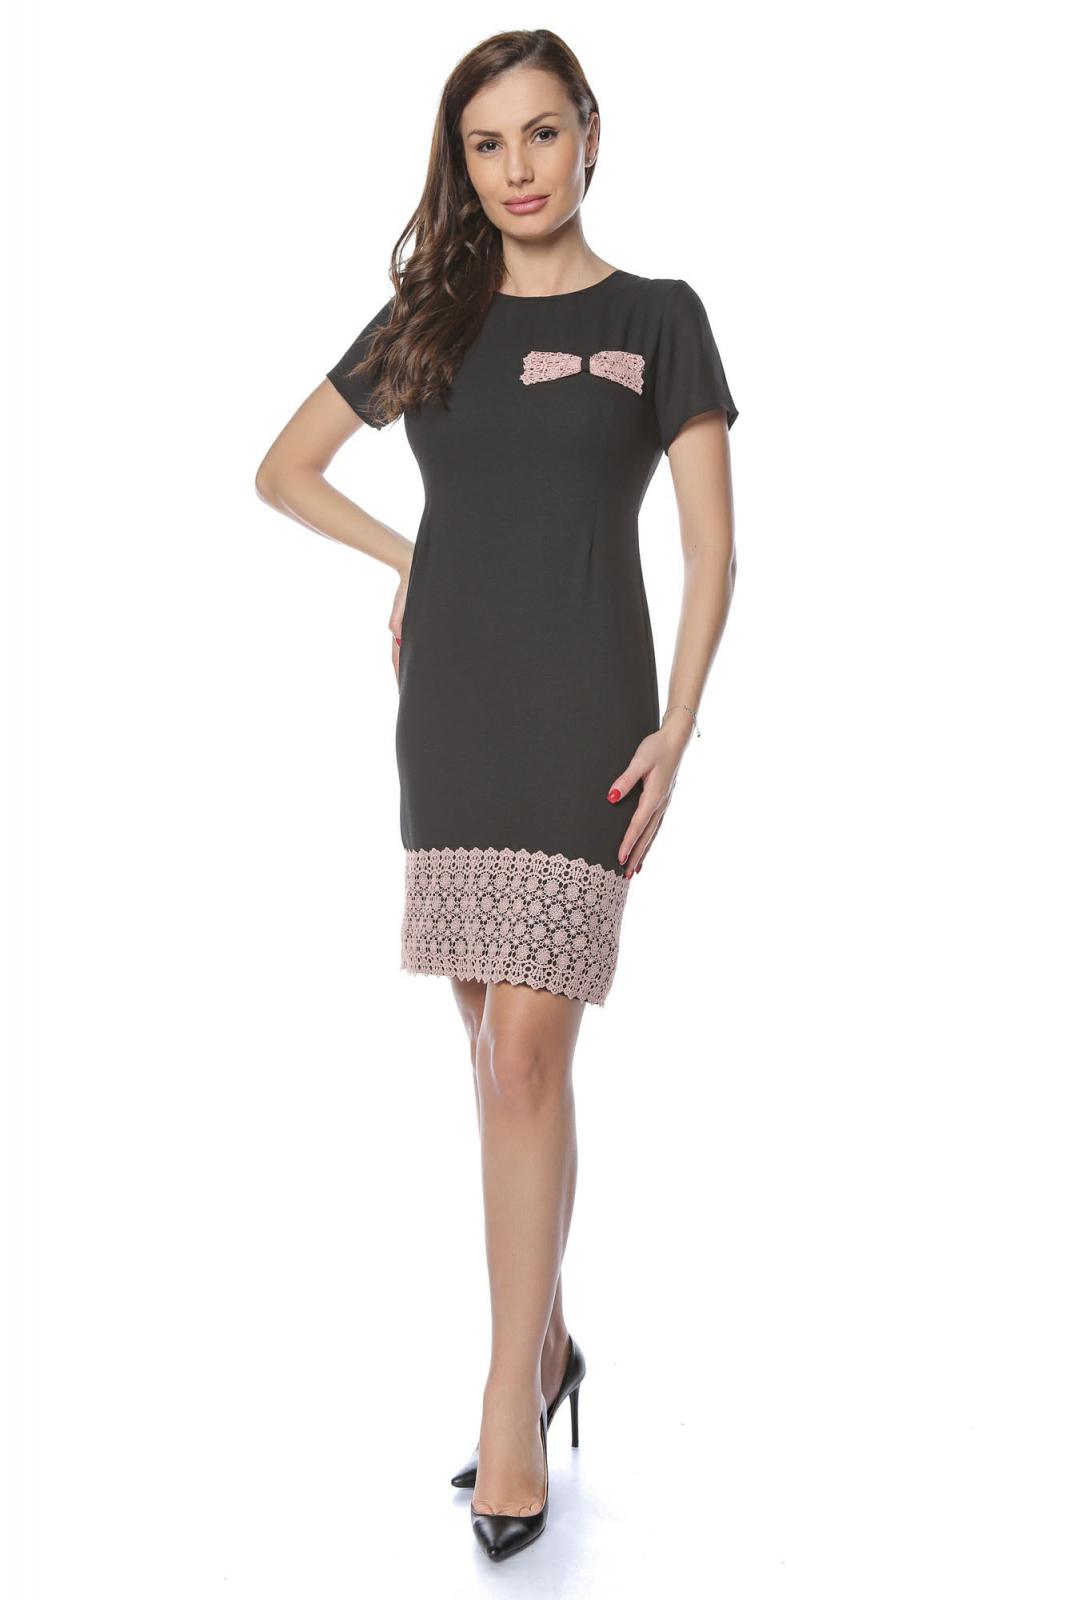 pret ieftin pre-comanda cea mai recentă Rochie dama eleganta neagra cu dantela brodata aplicata RO235